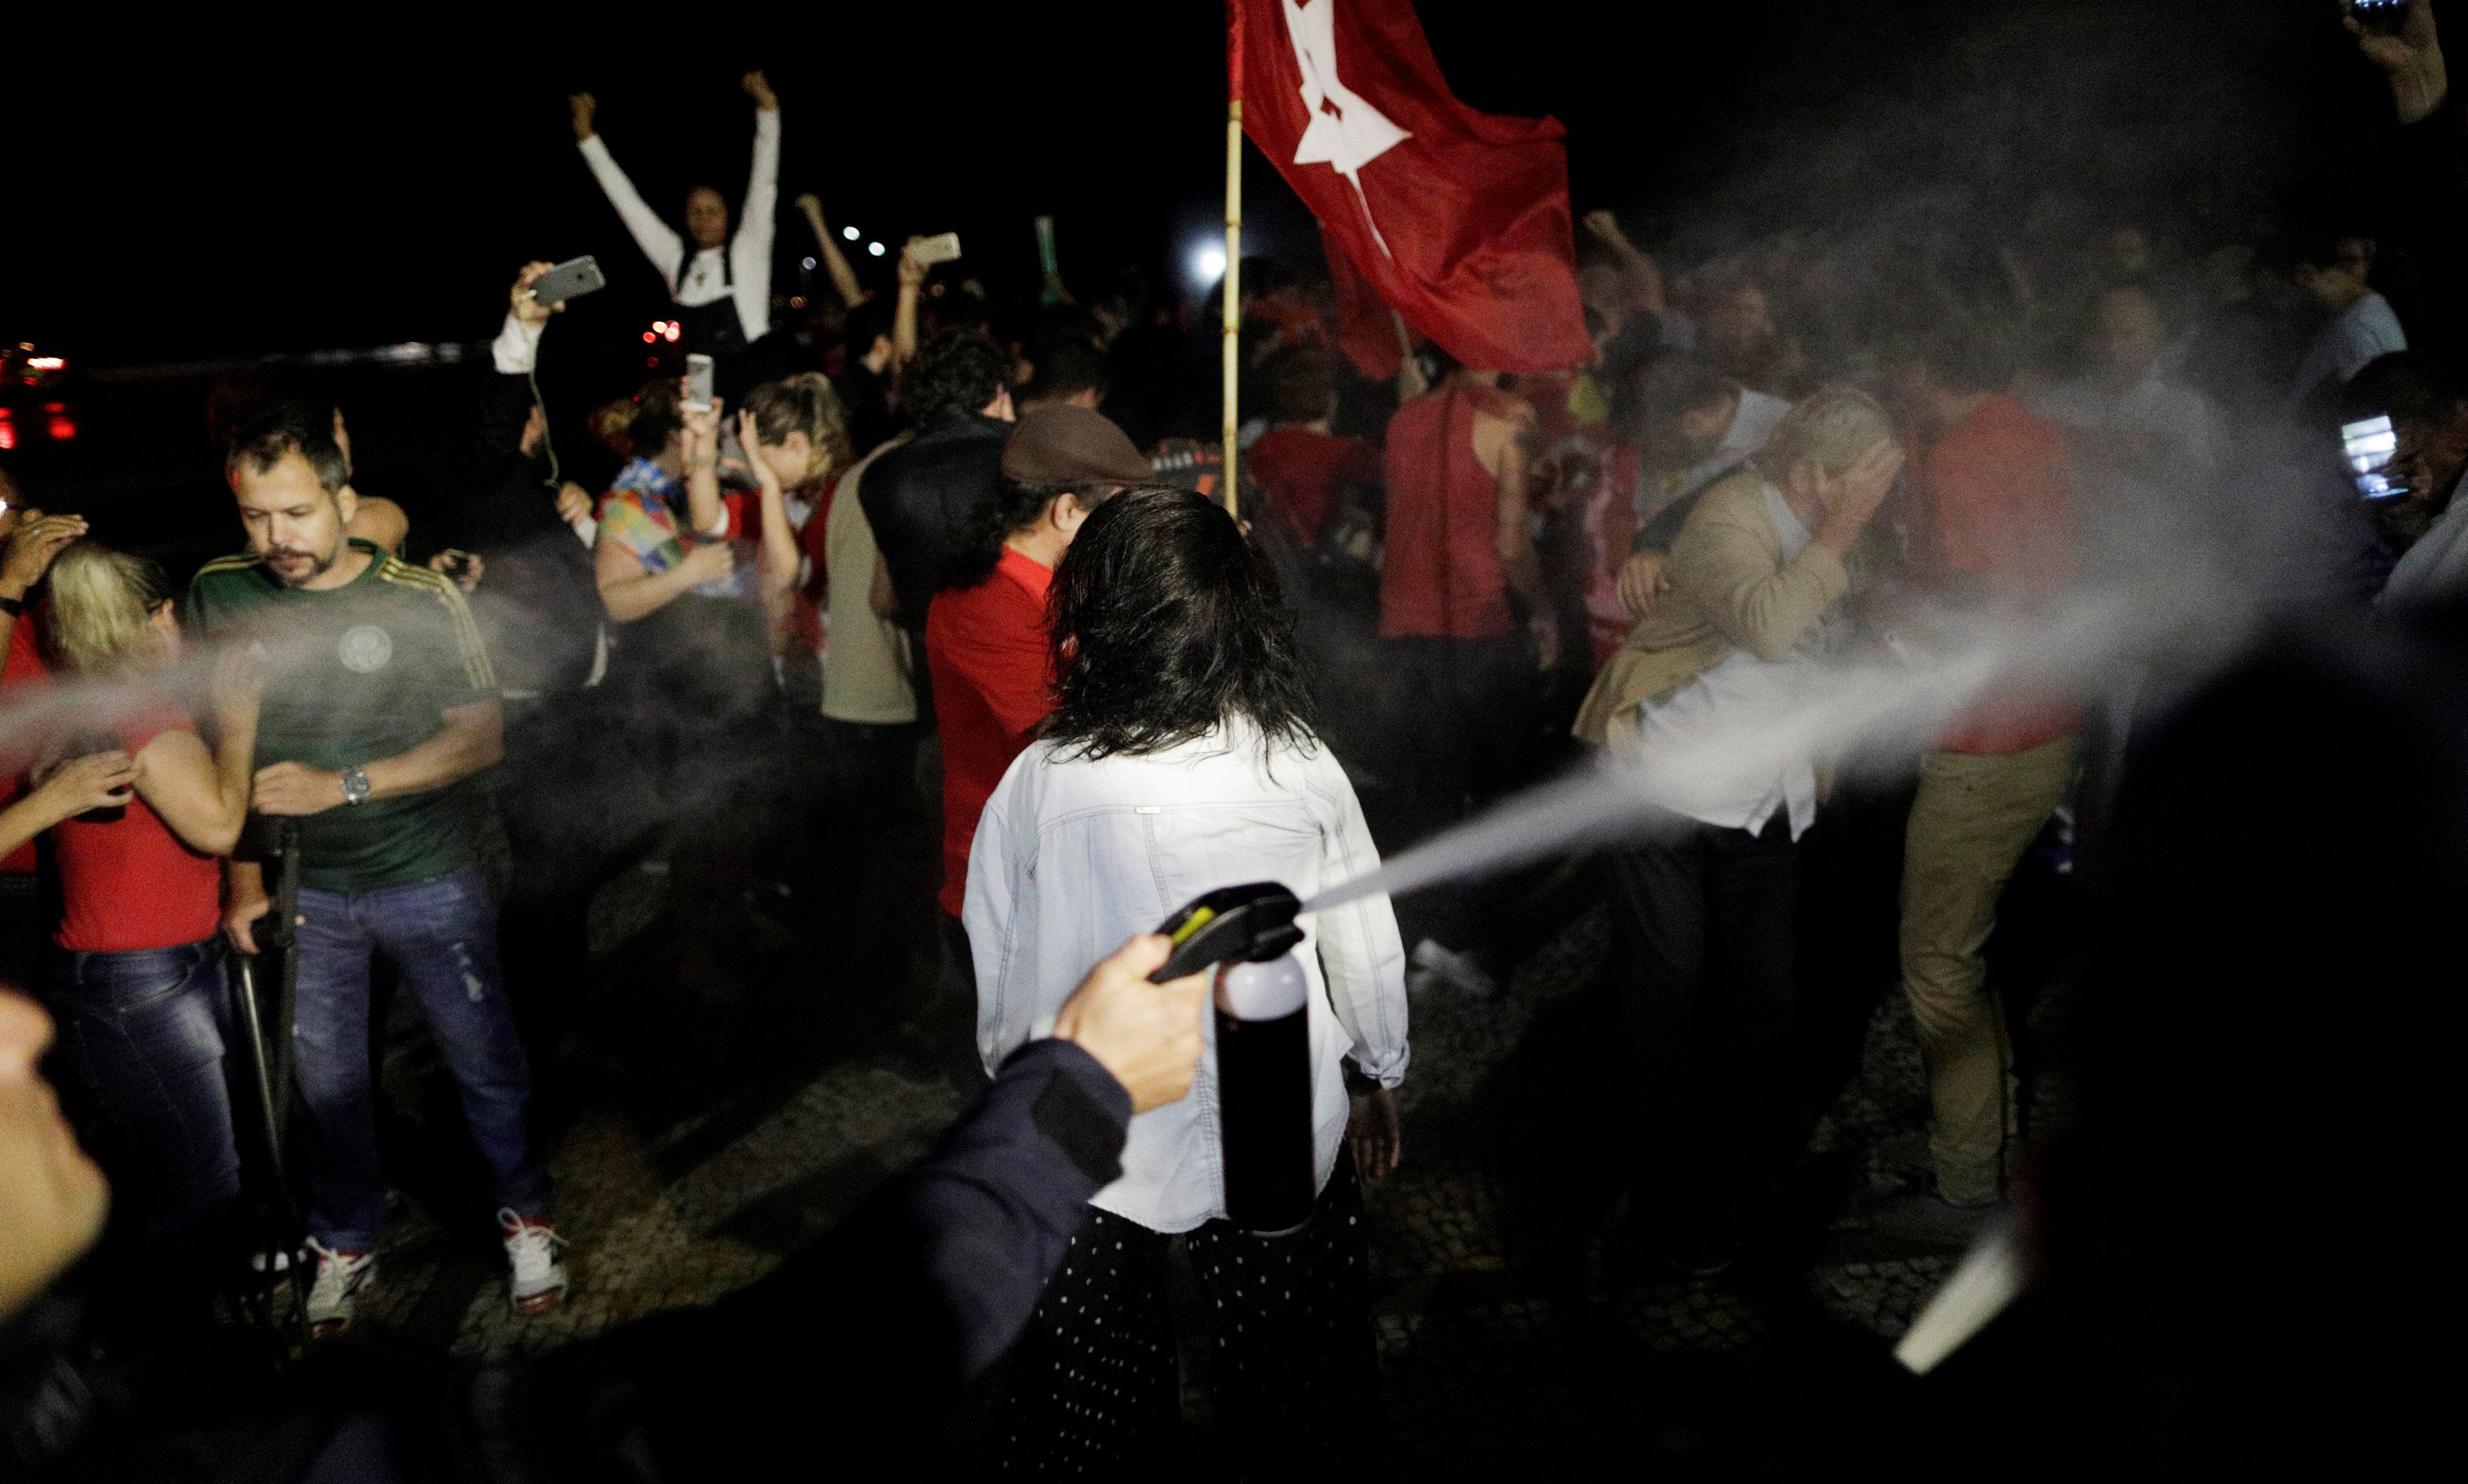 Manifestação no Palácio do Planalto tem princípio de tumulto